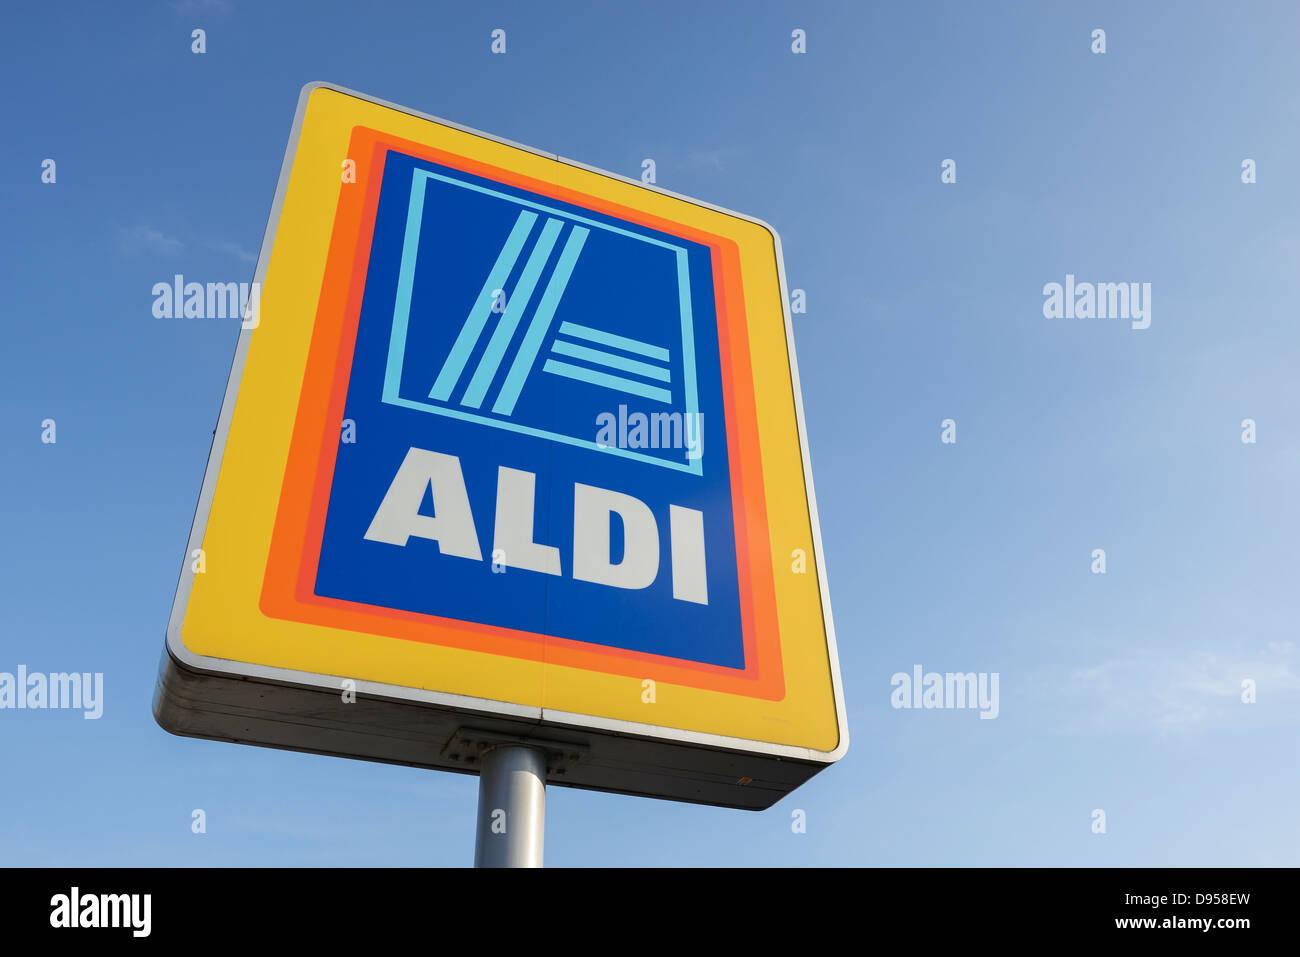 Aldi supermarket sign Stock Photo